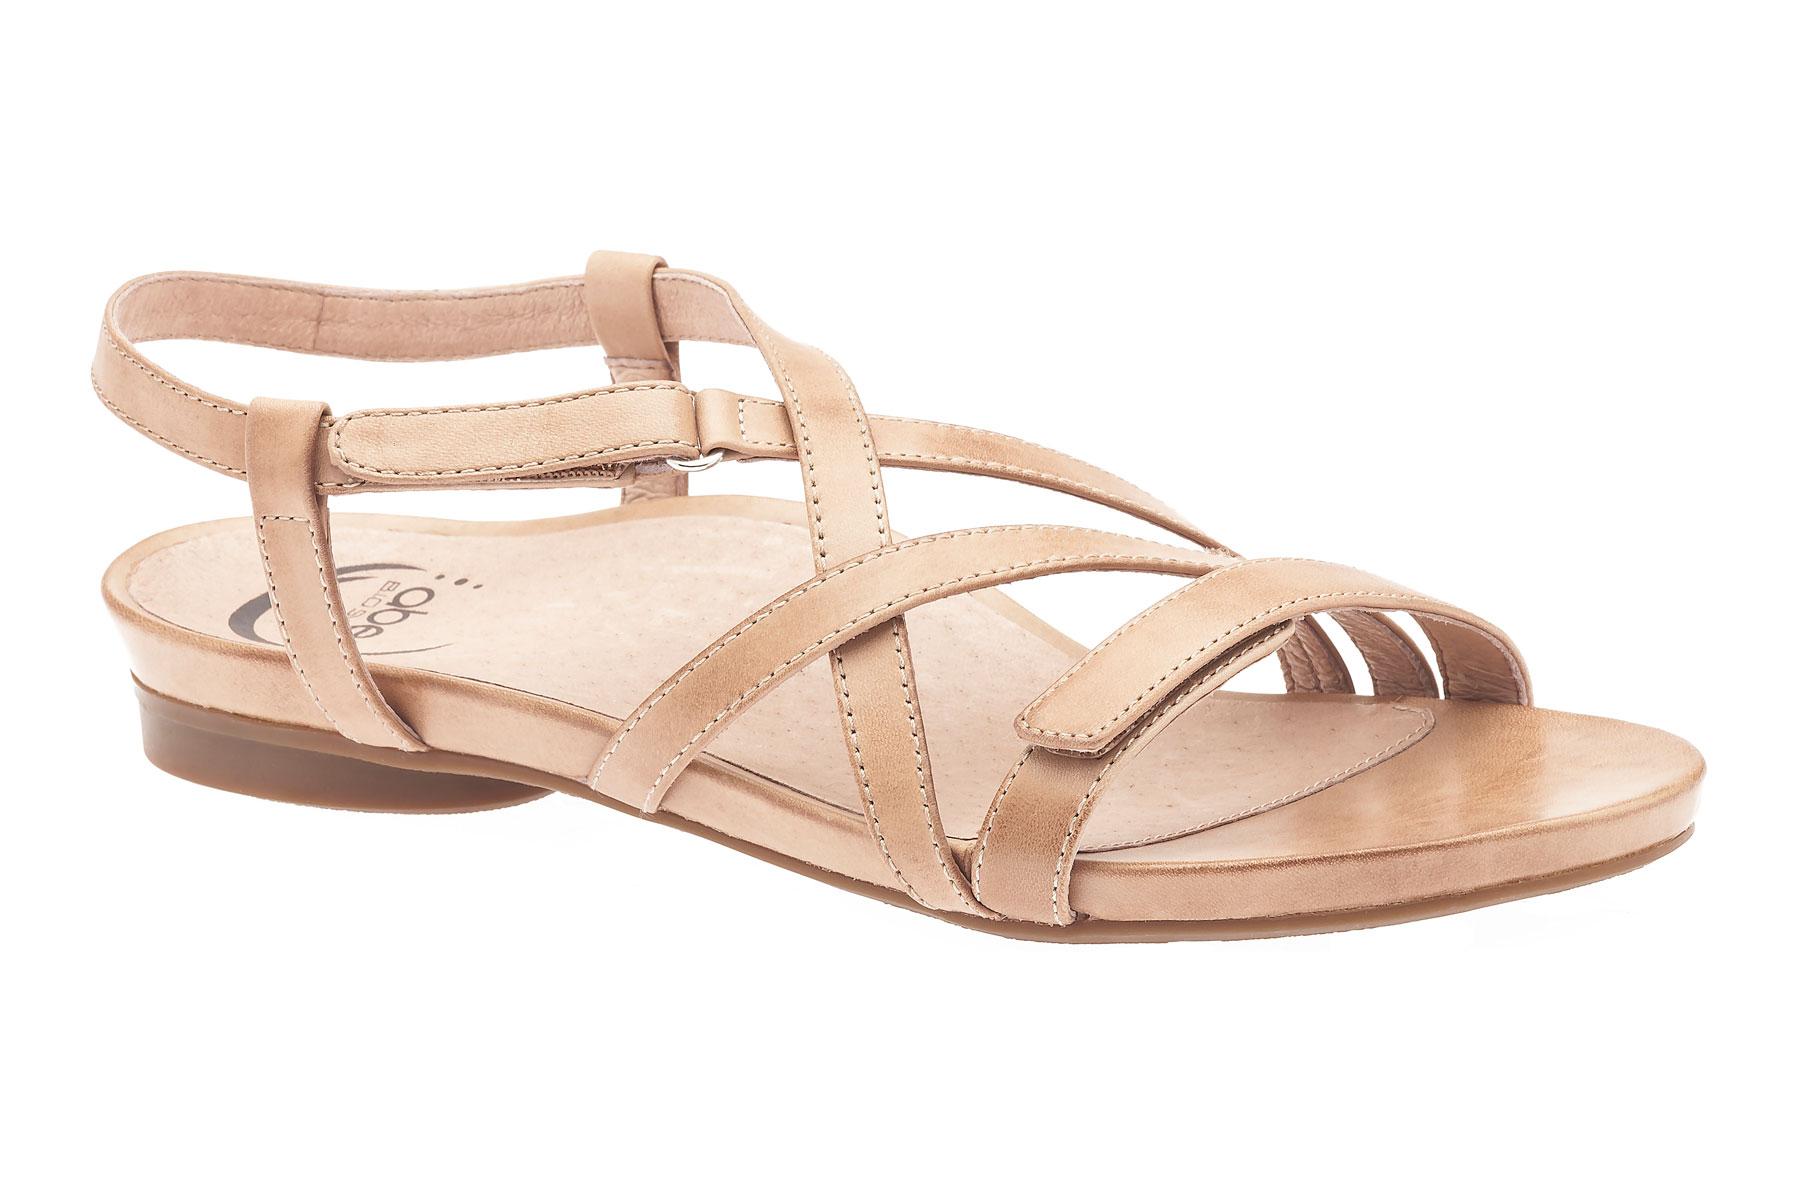 Samantha Metatarsal - Low Heel Sandals